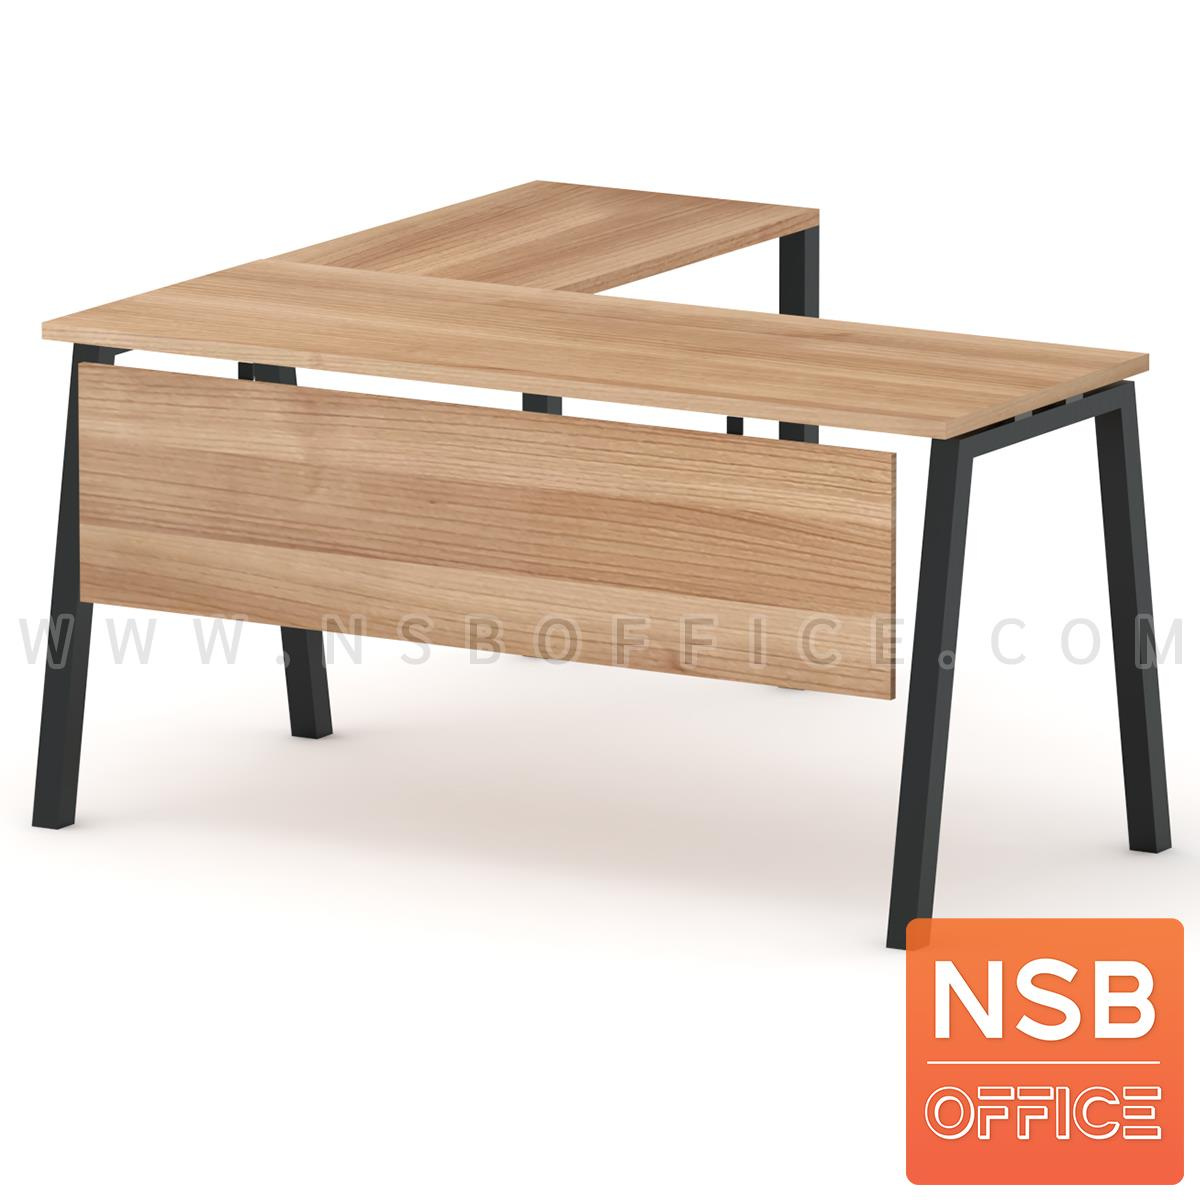 A16A087:โต๊ะทำงานตัวแอล รุ่น Helsingki (เฮลซิงกิ) ขนาด 150W1*140W2 cm. พร้อมบังตาไม้ ขาเหล็ก